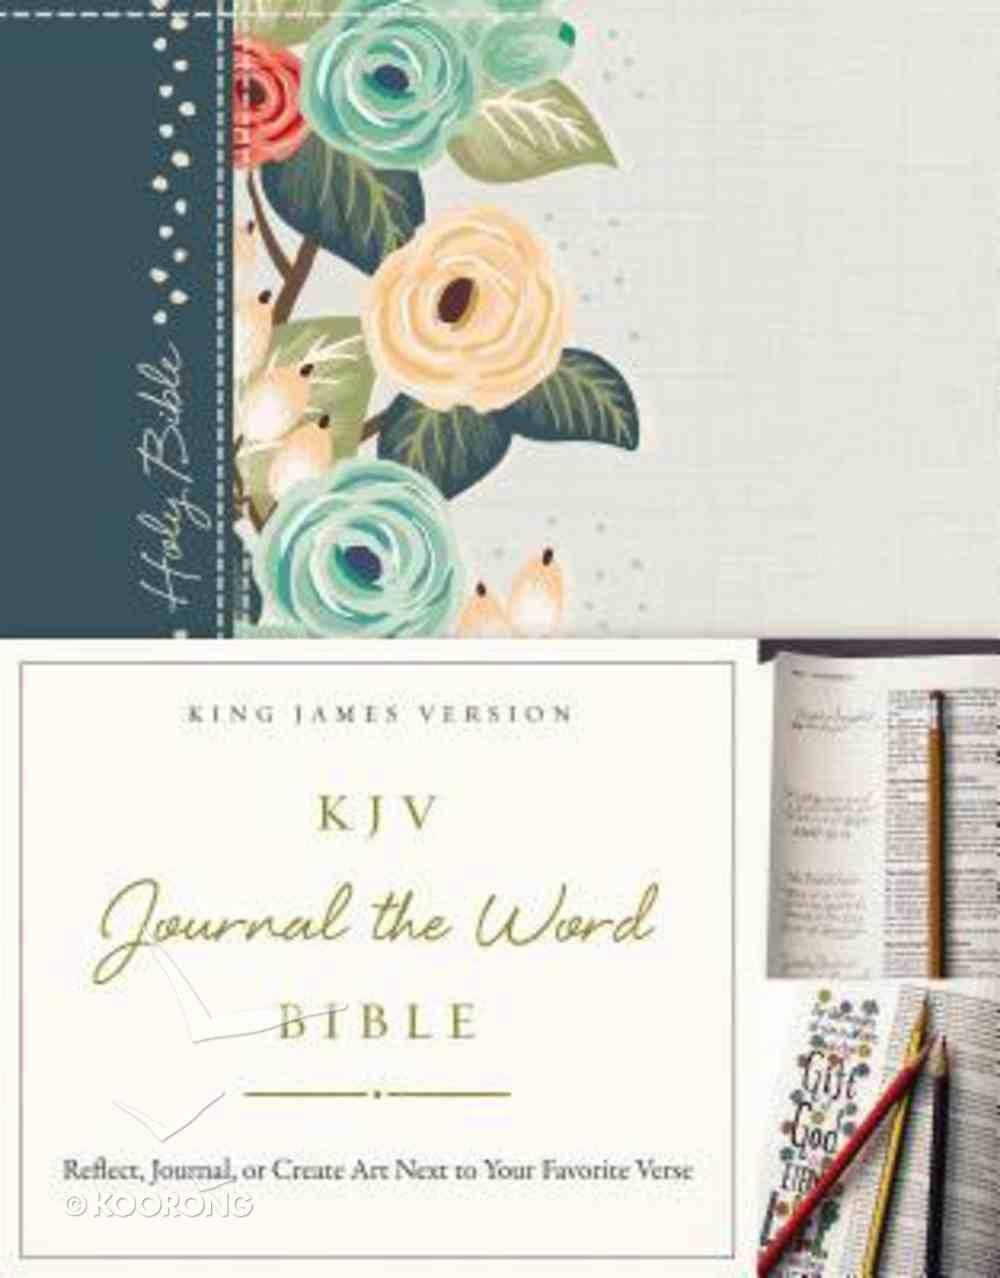 KJV Journal the Word Bible Green Floral (Red Letter Edition) Hardback